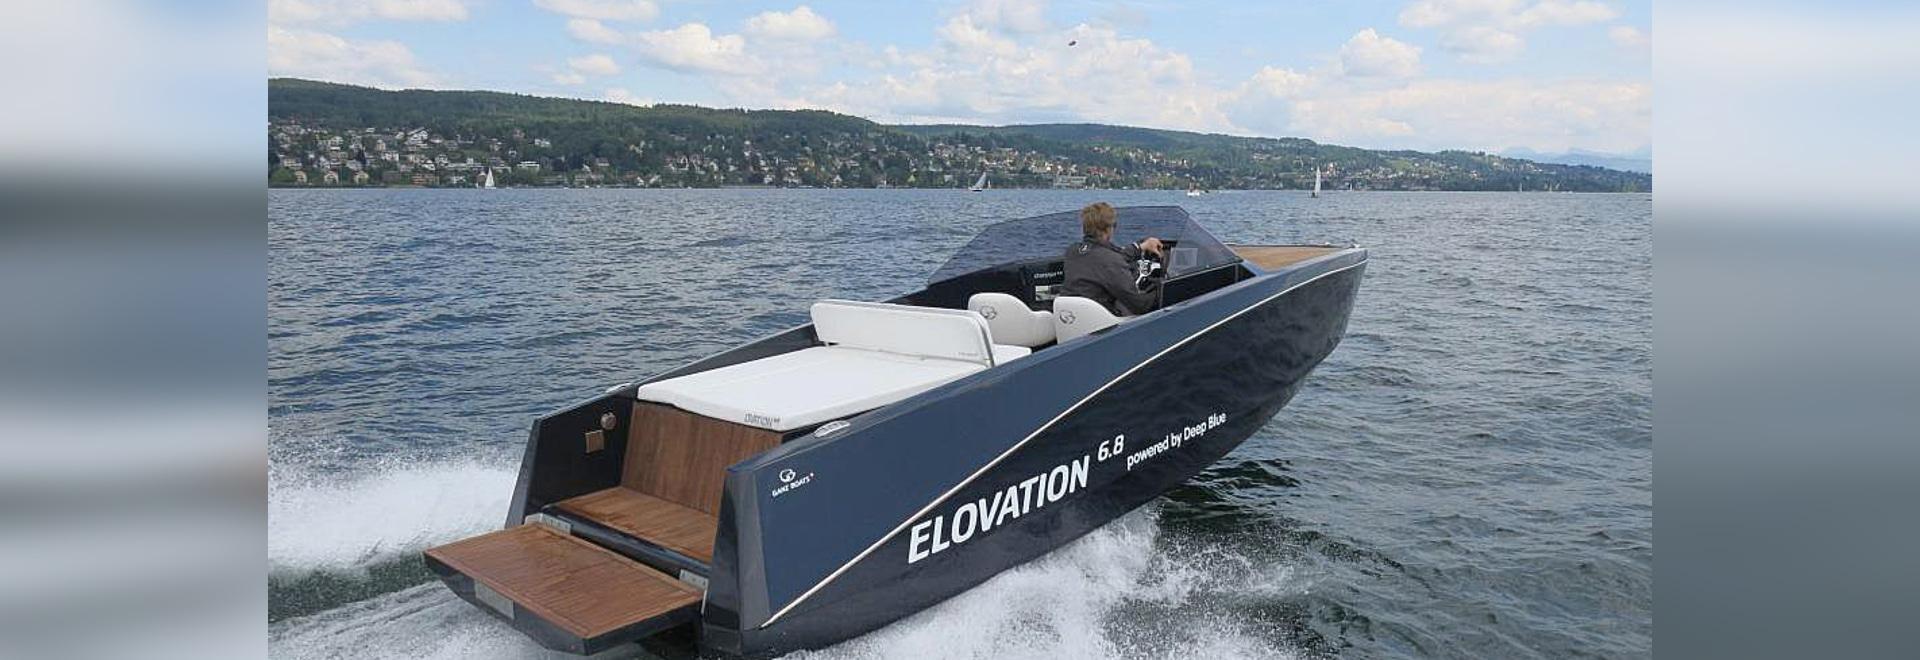 Elovation 6.8 New with torqeedo deep blue 80